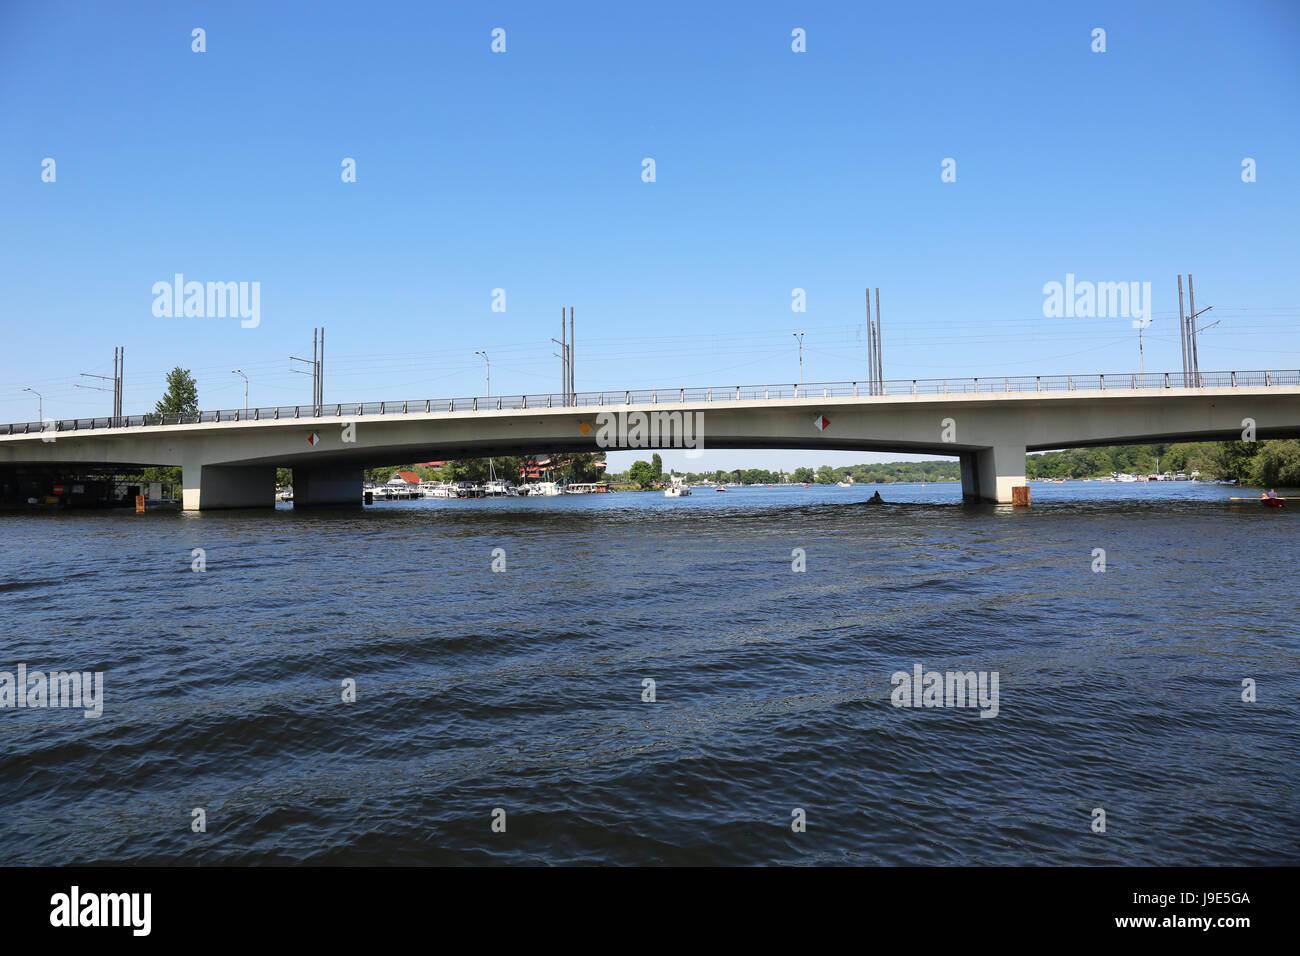 bridge, potsdam, berliner, arterial road, concrete, steel, centre, city, Stock Photo